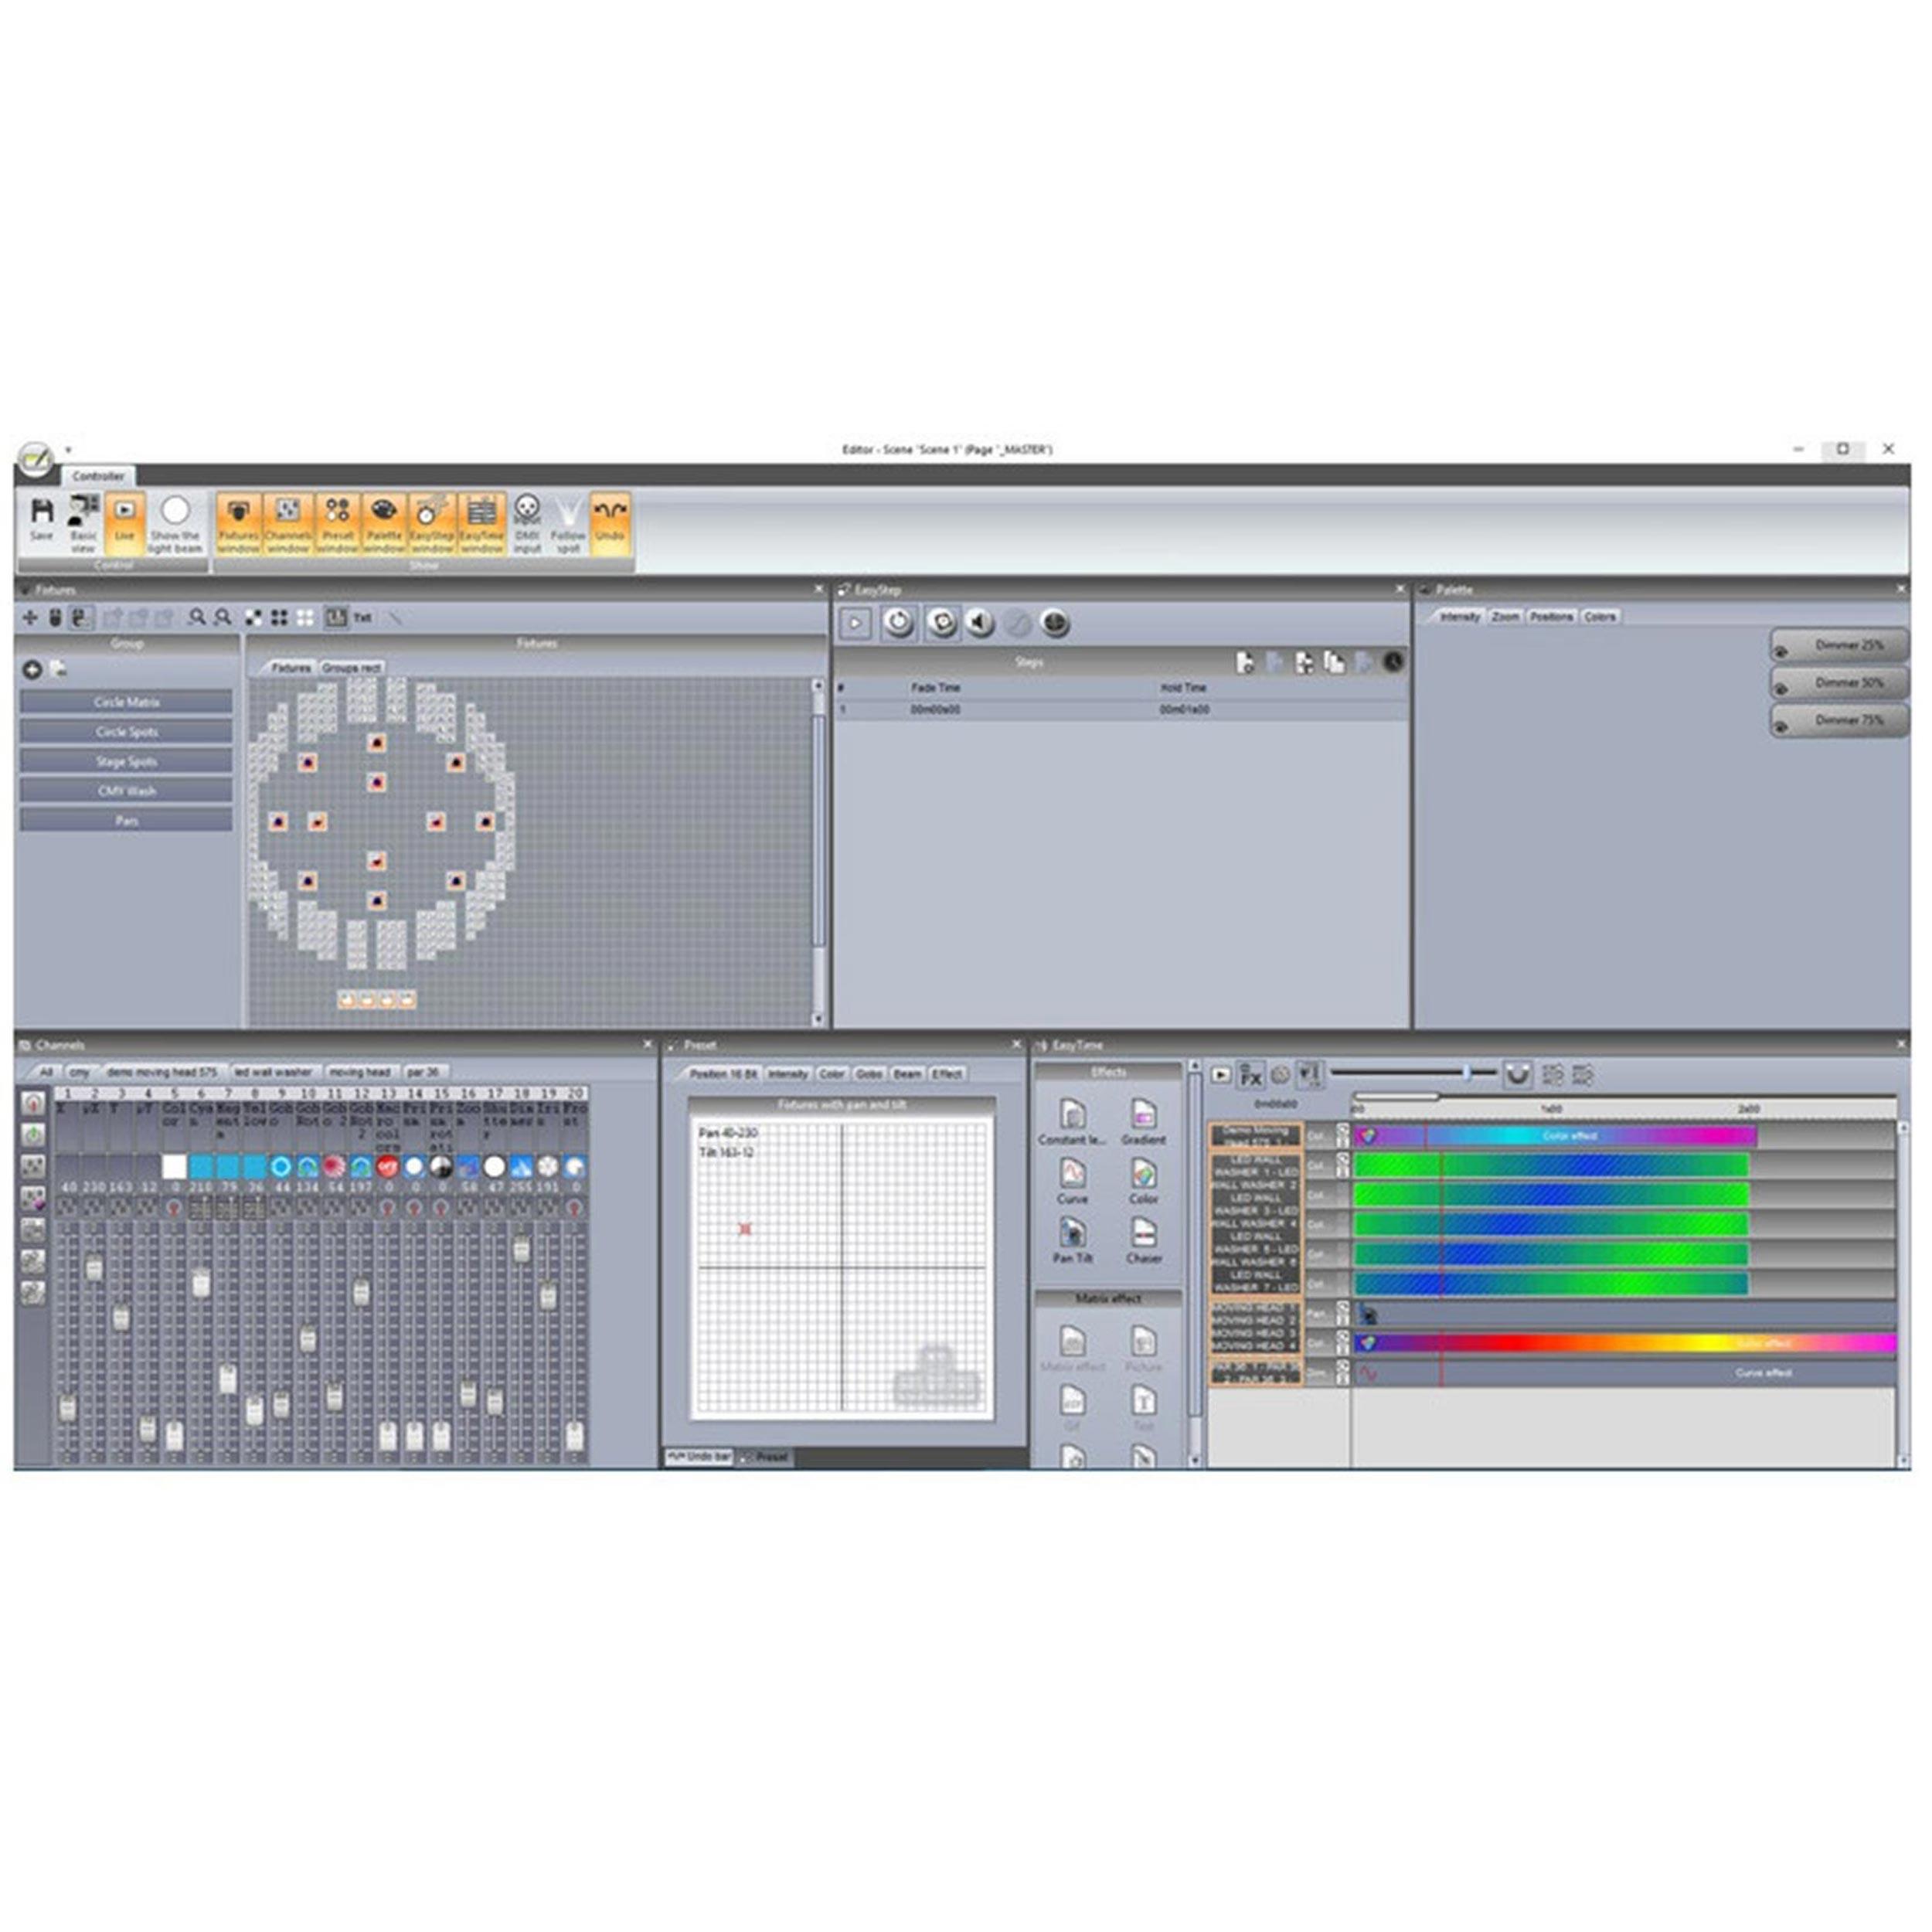 AMERICAN DJ ADJ COMPU SDE PC 3 Universe DMX Control 4 Artnet Universe  Interface